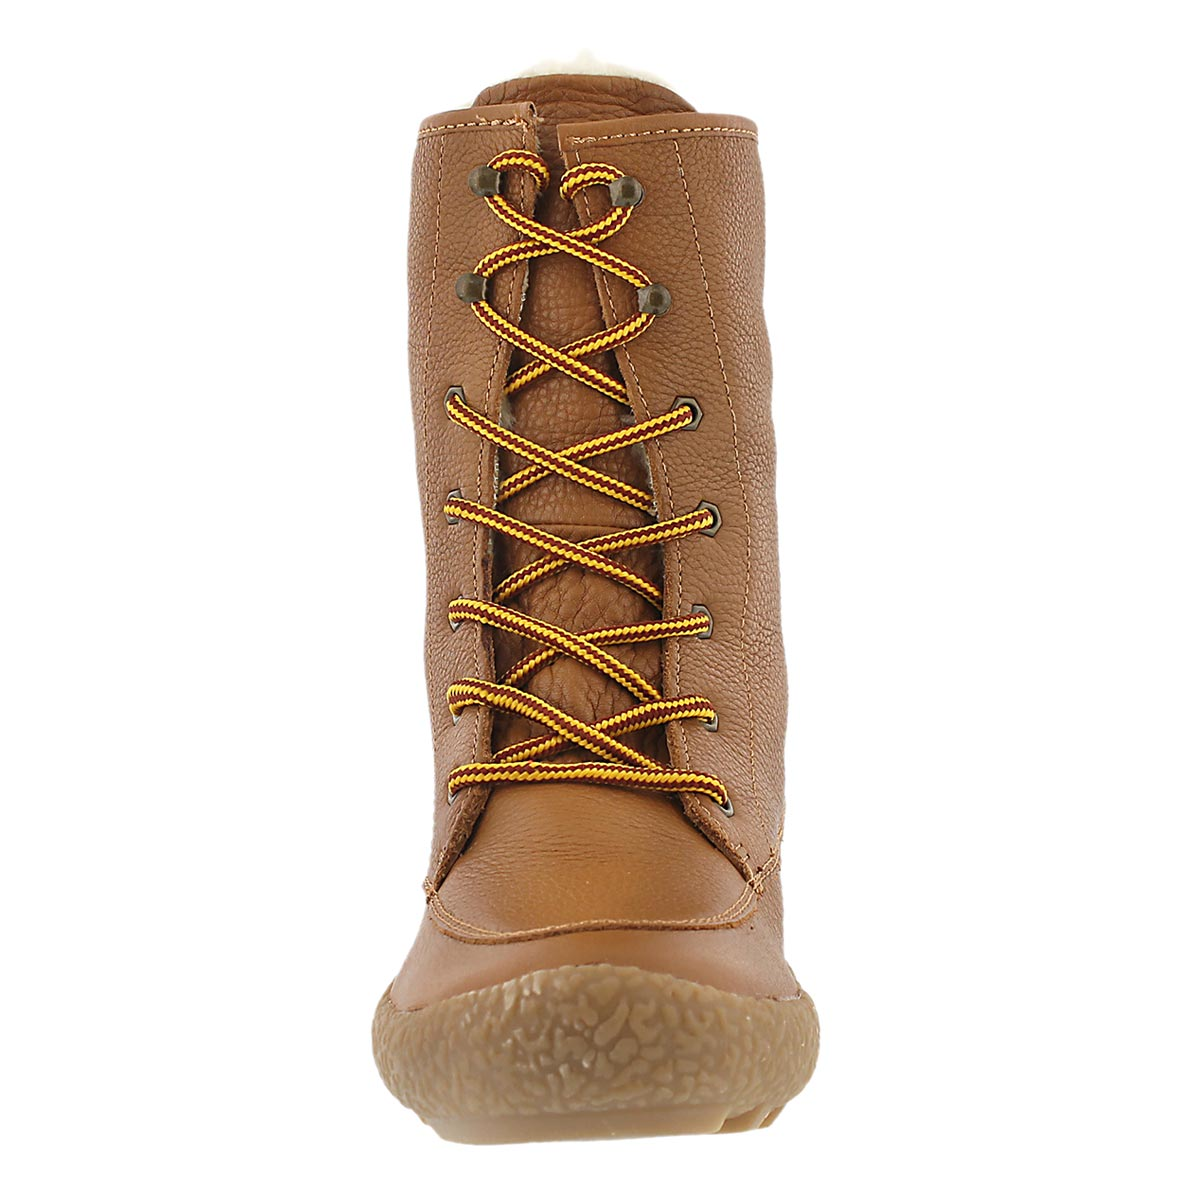 Lds Cheyenne cedar wtrpf winter boot